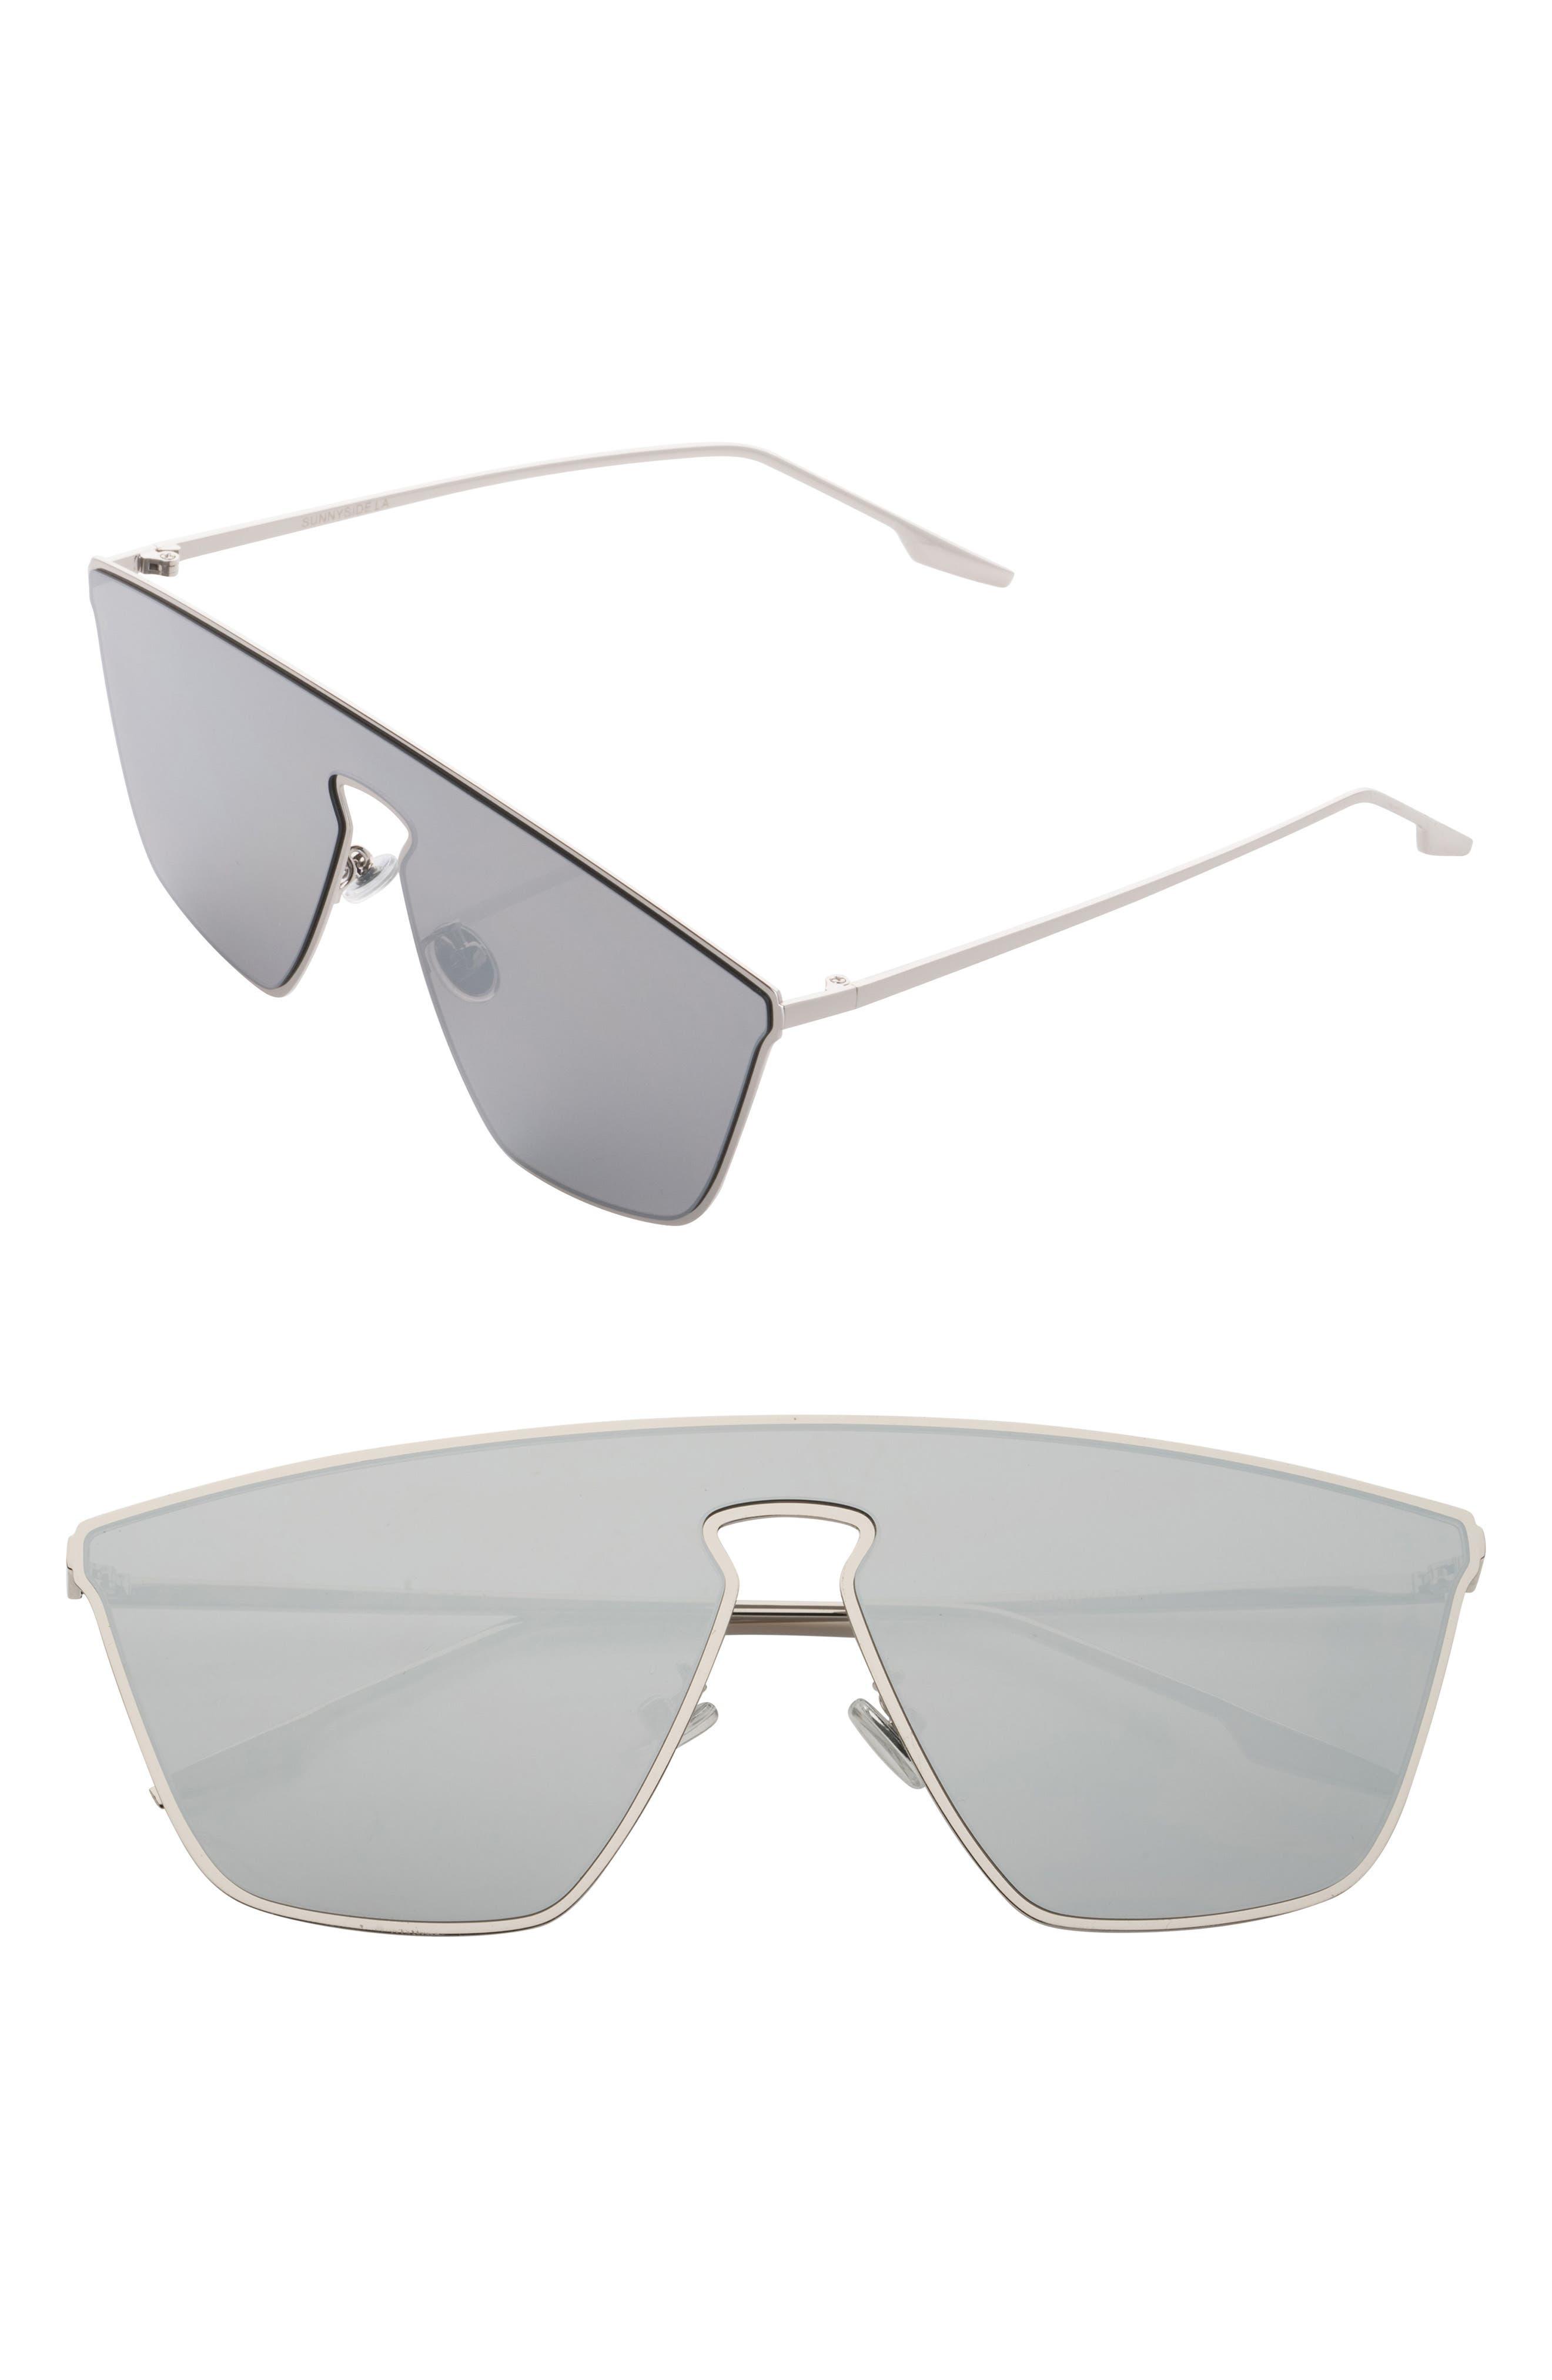 65mm Shield Sunglasses,                             Main thumbnail 1, color,                             Silver